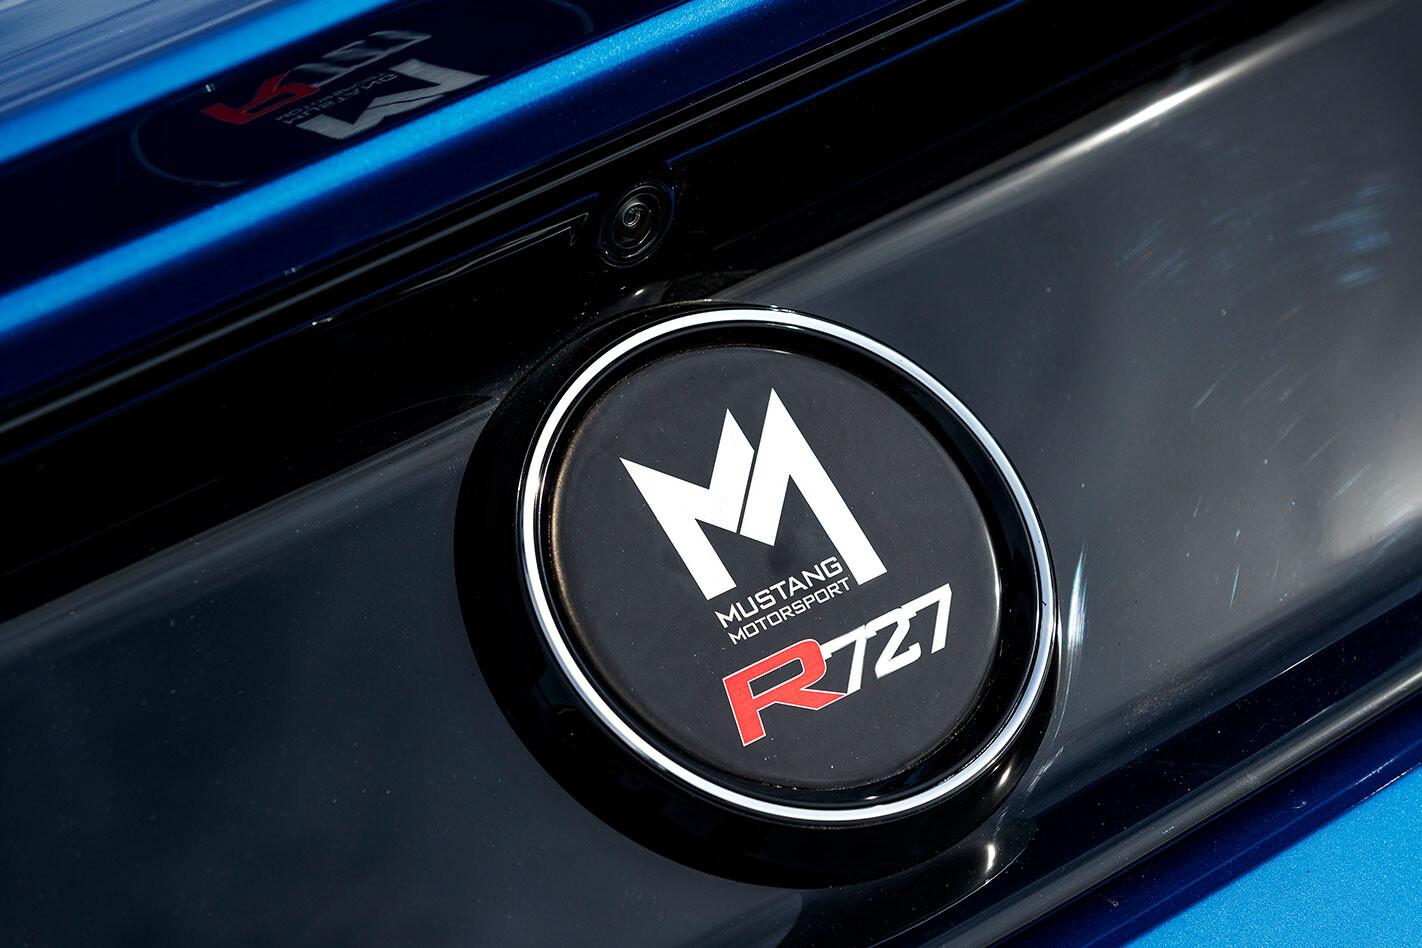 Hot Tuner 2017 Winner Ford Mustang Motorsport MM R 727 Review Jpg